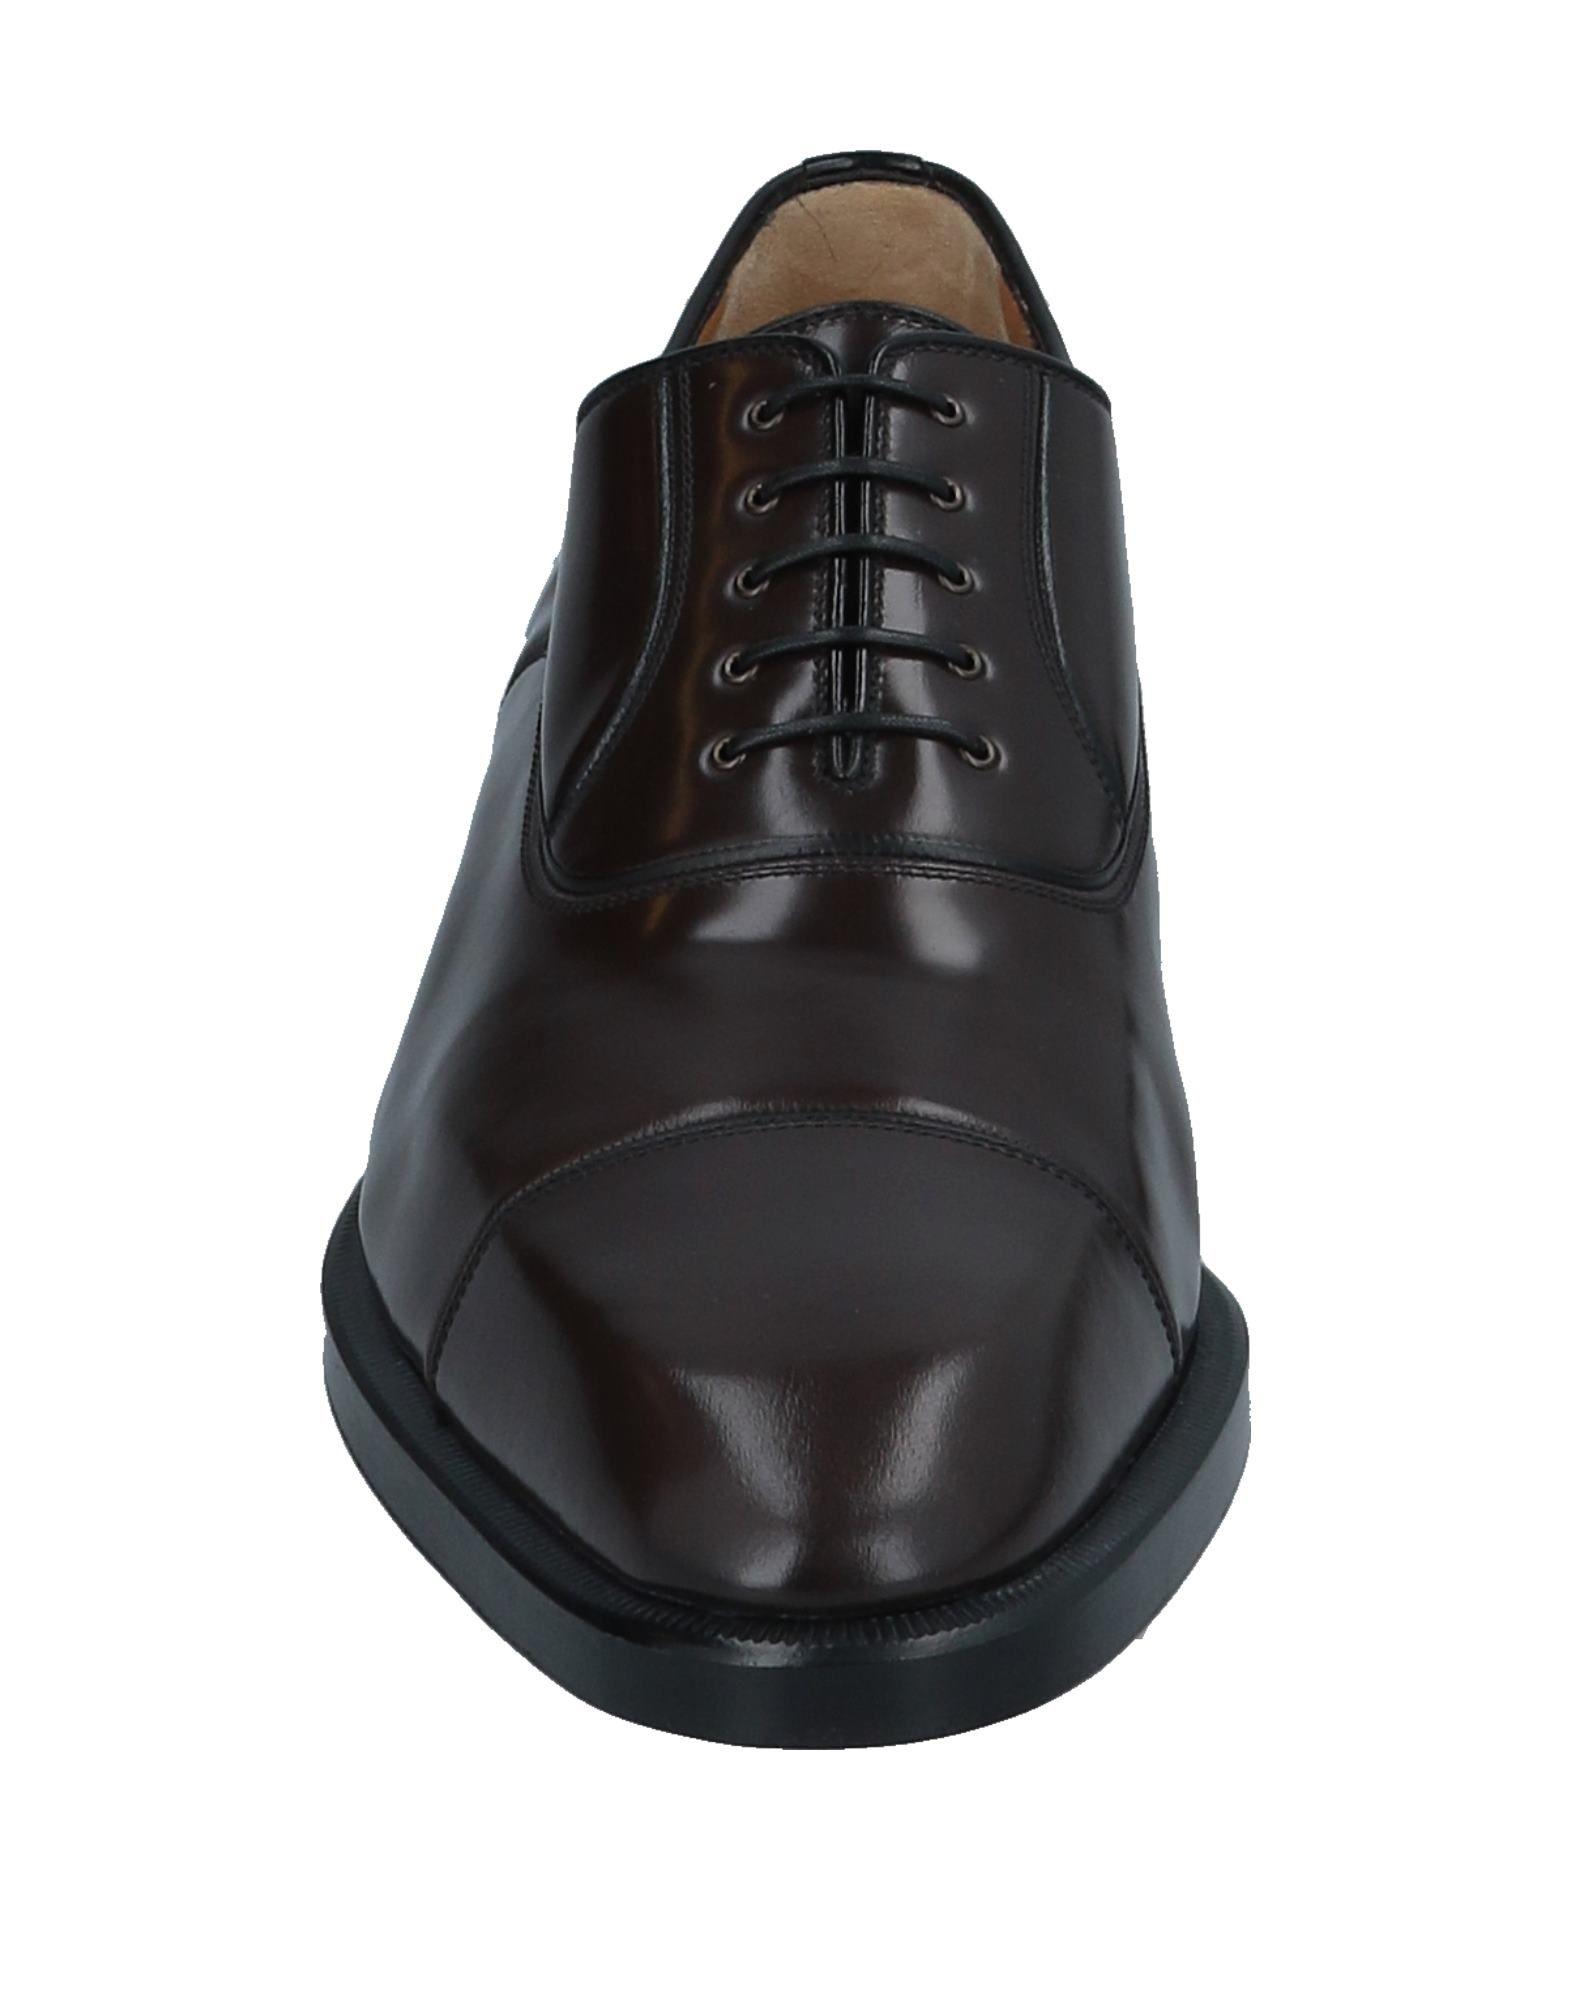 A.Testoni Schnürschuhe Schnürschuhe A.Testoni Herren  11542472SC Gute Qualität beliebte Schuhe fdc3d1